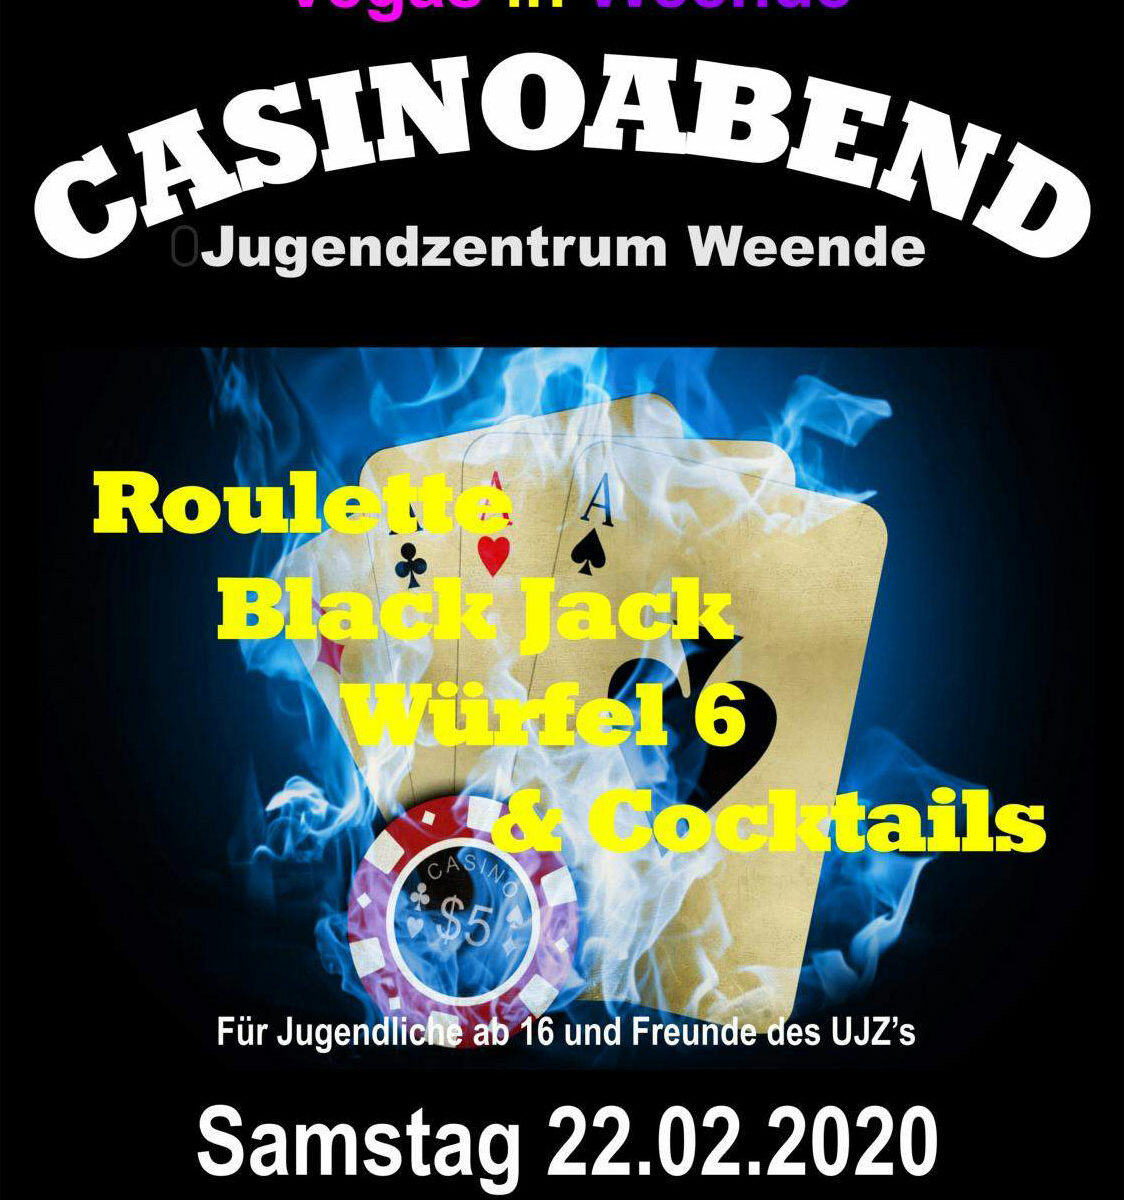 casinoabend-plakat